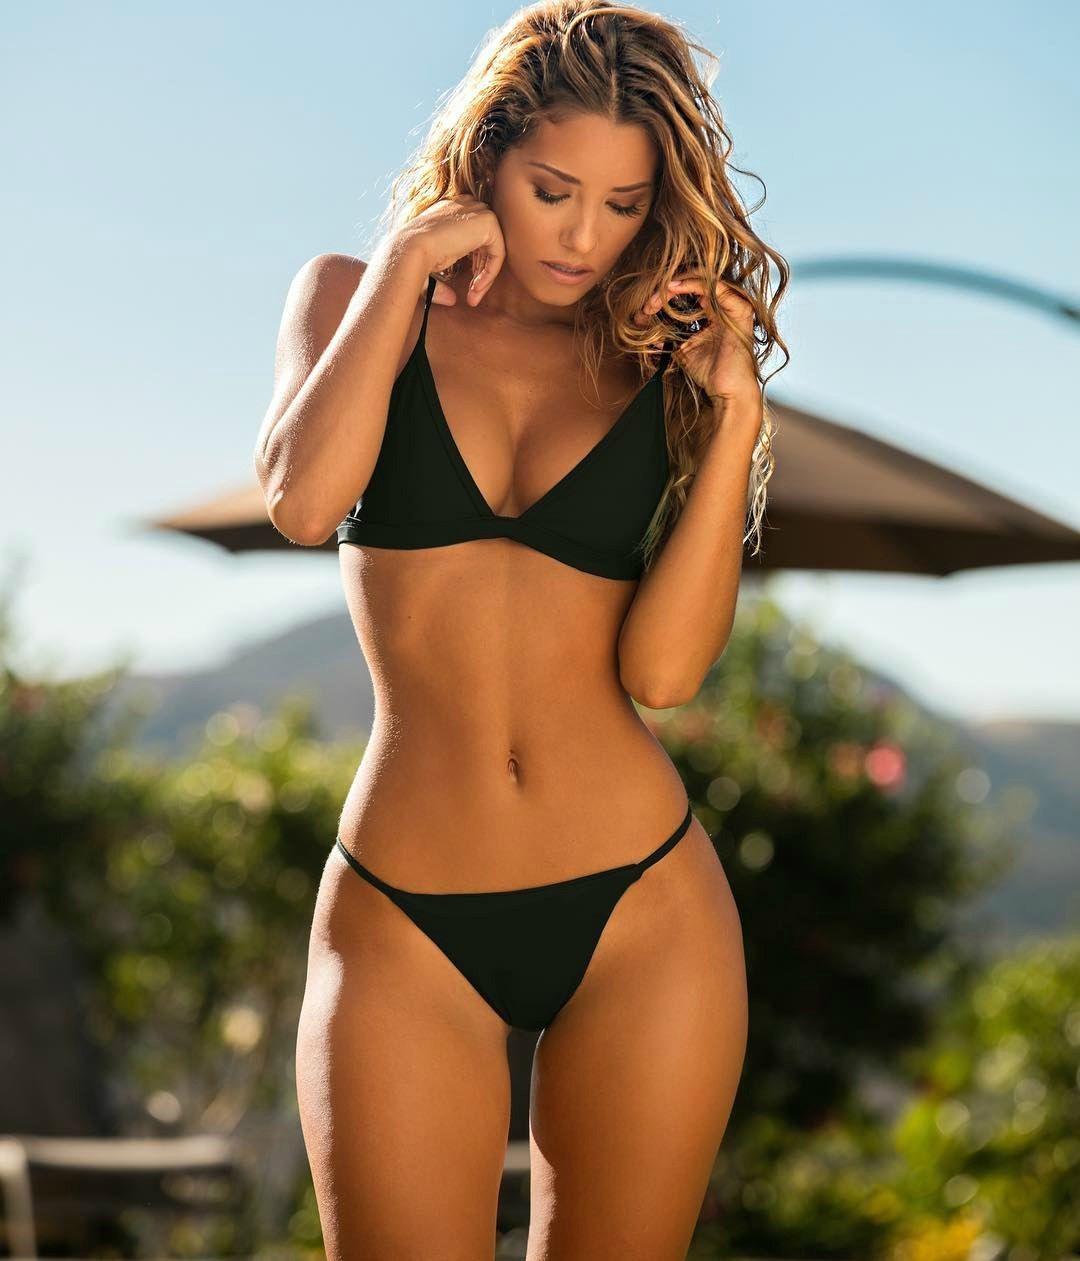 Y bikini pictures